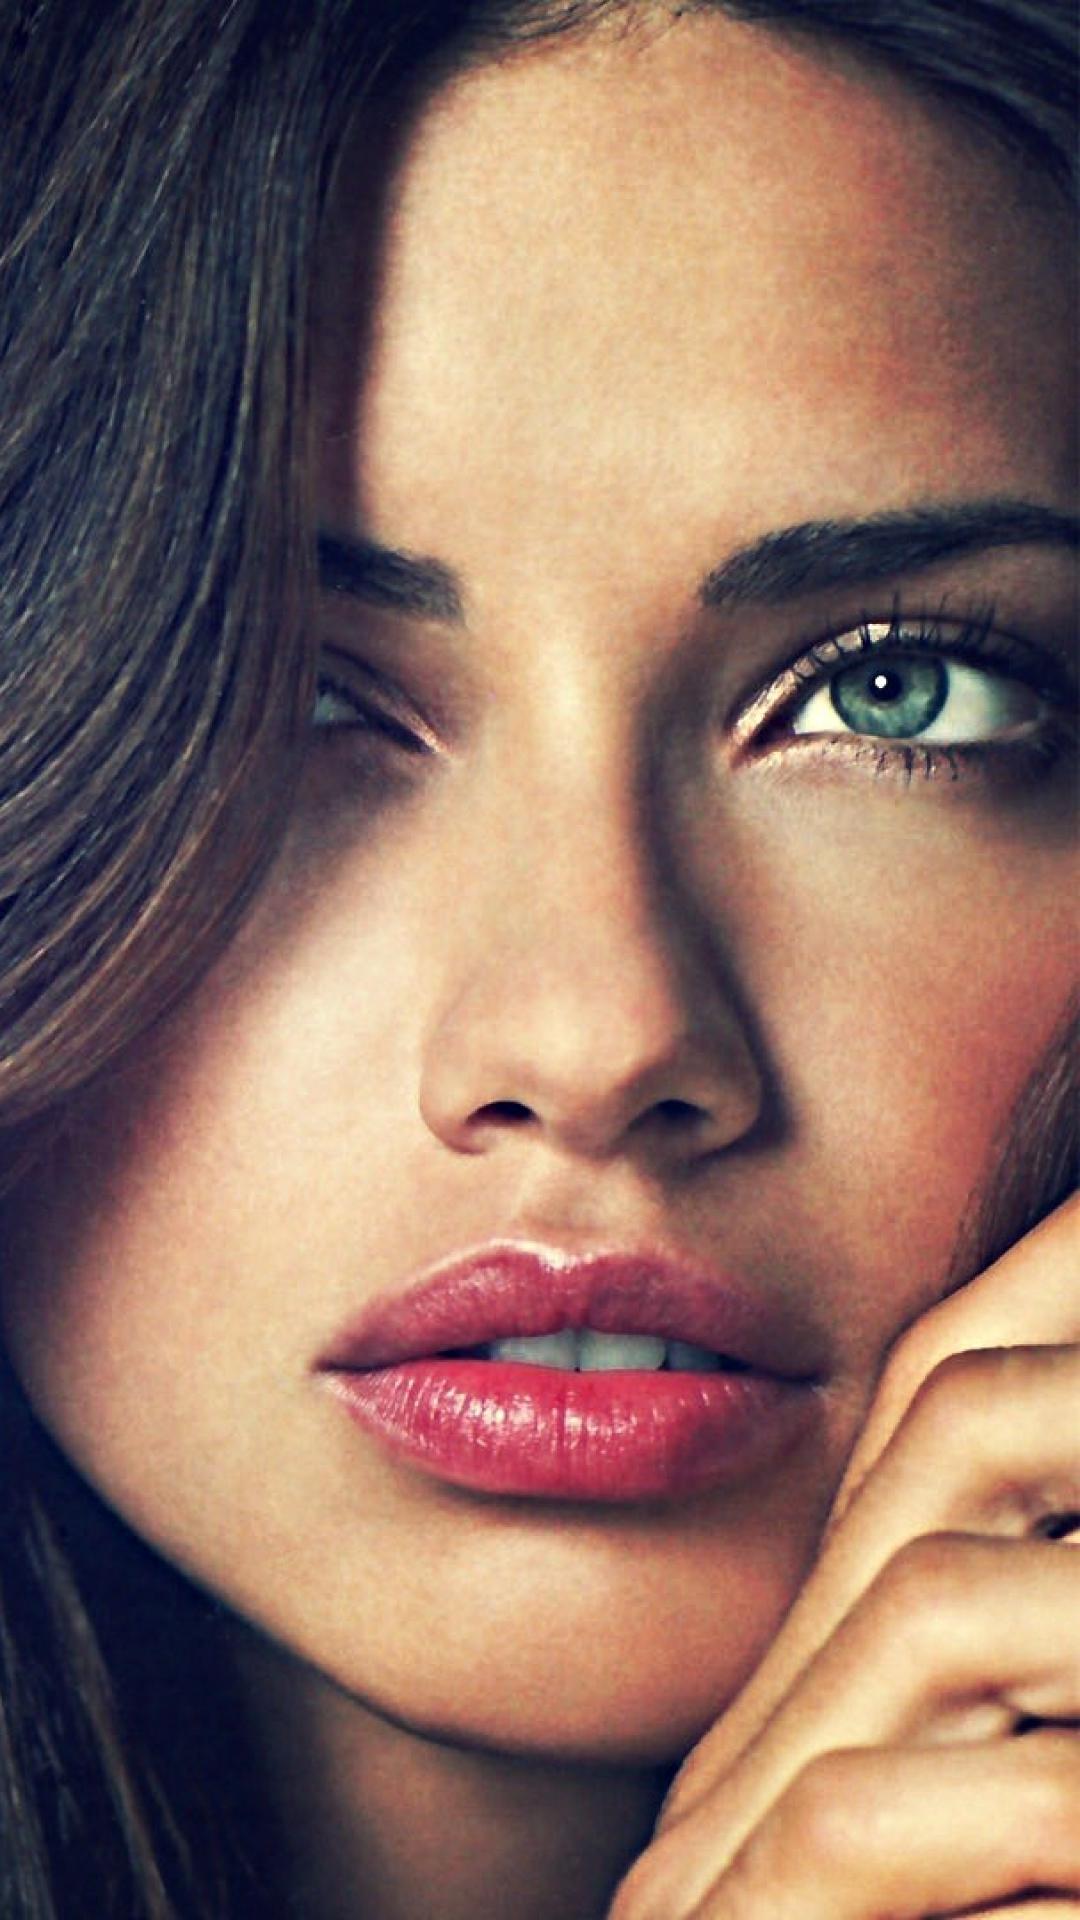 Htc One M8 Wallpaper Hd Victoria Secret Adriana Lima Best Htc One Wallpapers